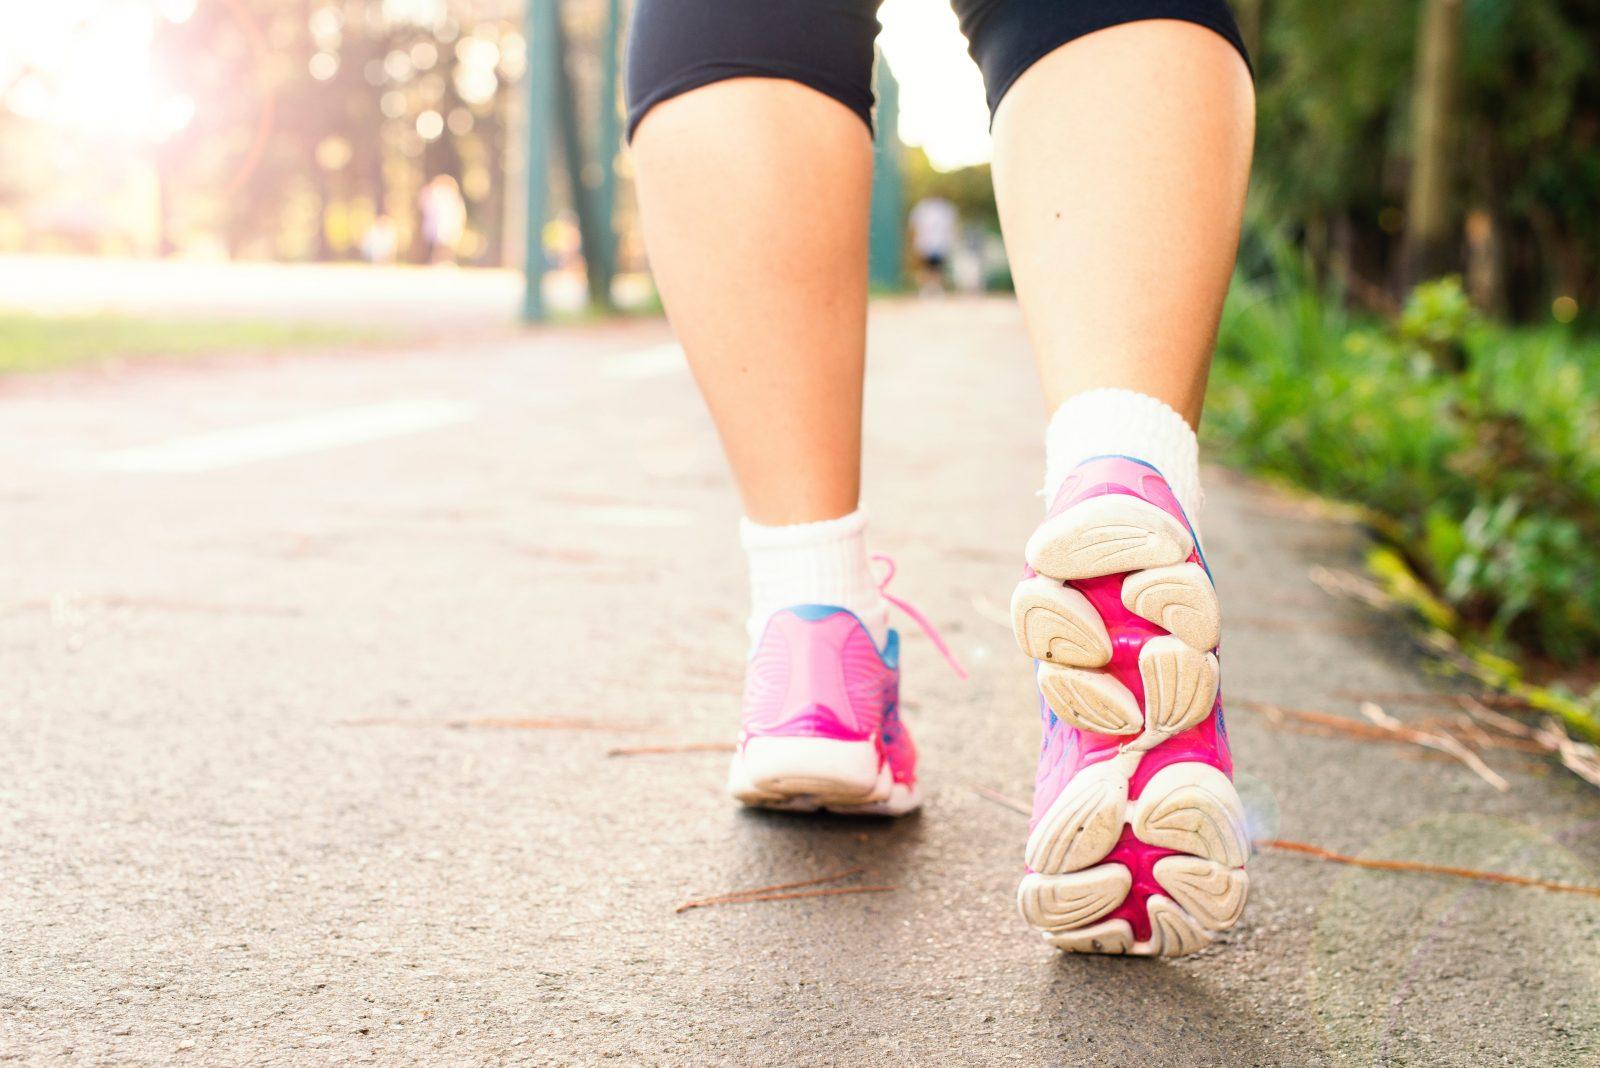 Hike for Hospice returns virtually